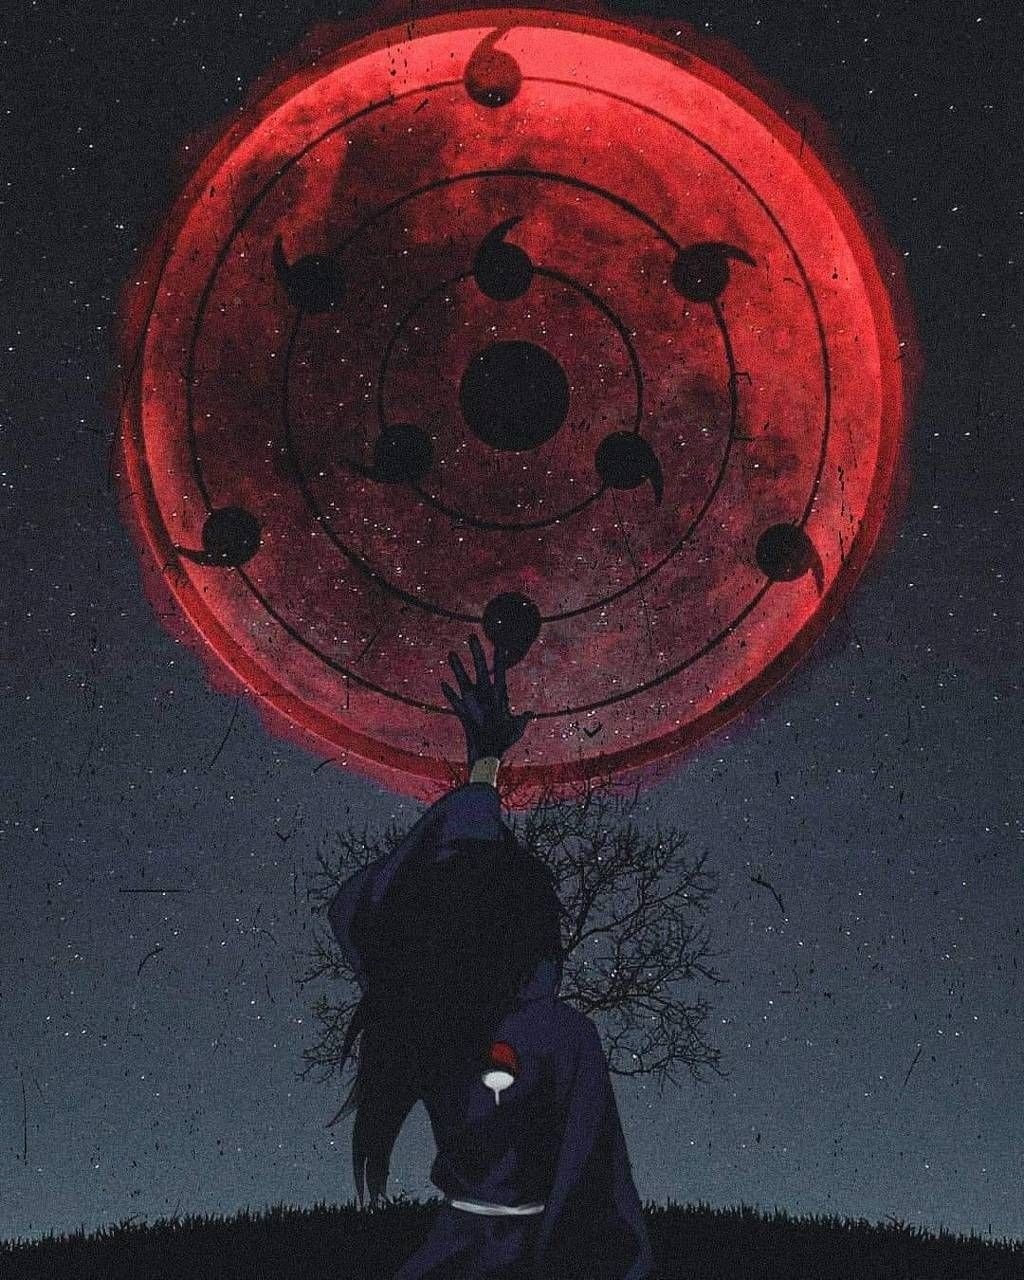 Download Naruto Madara Wallpaper By Xerox45 3a Free On